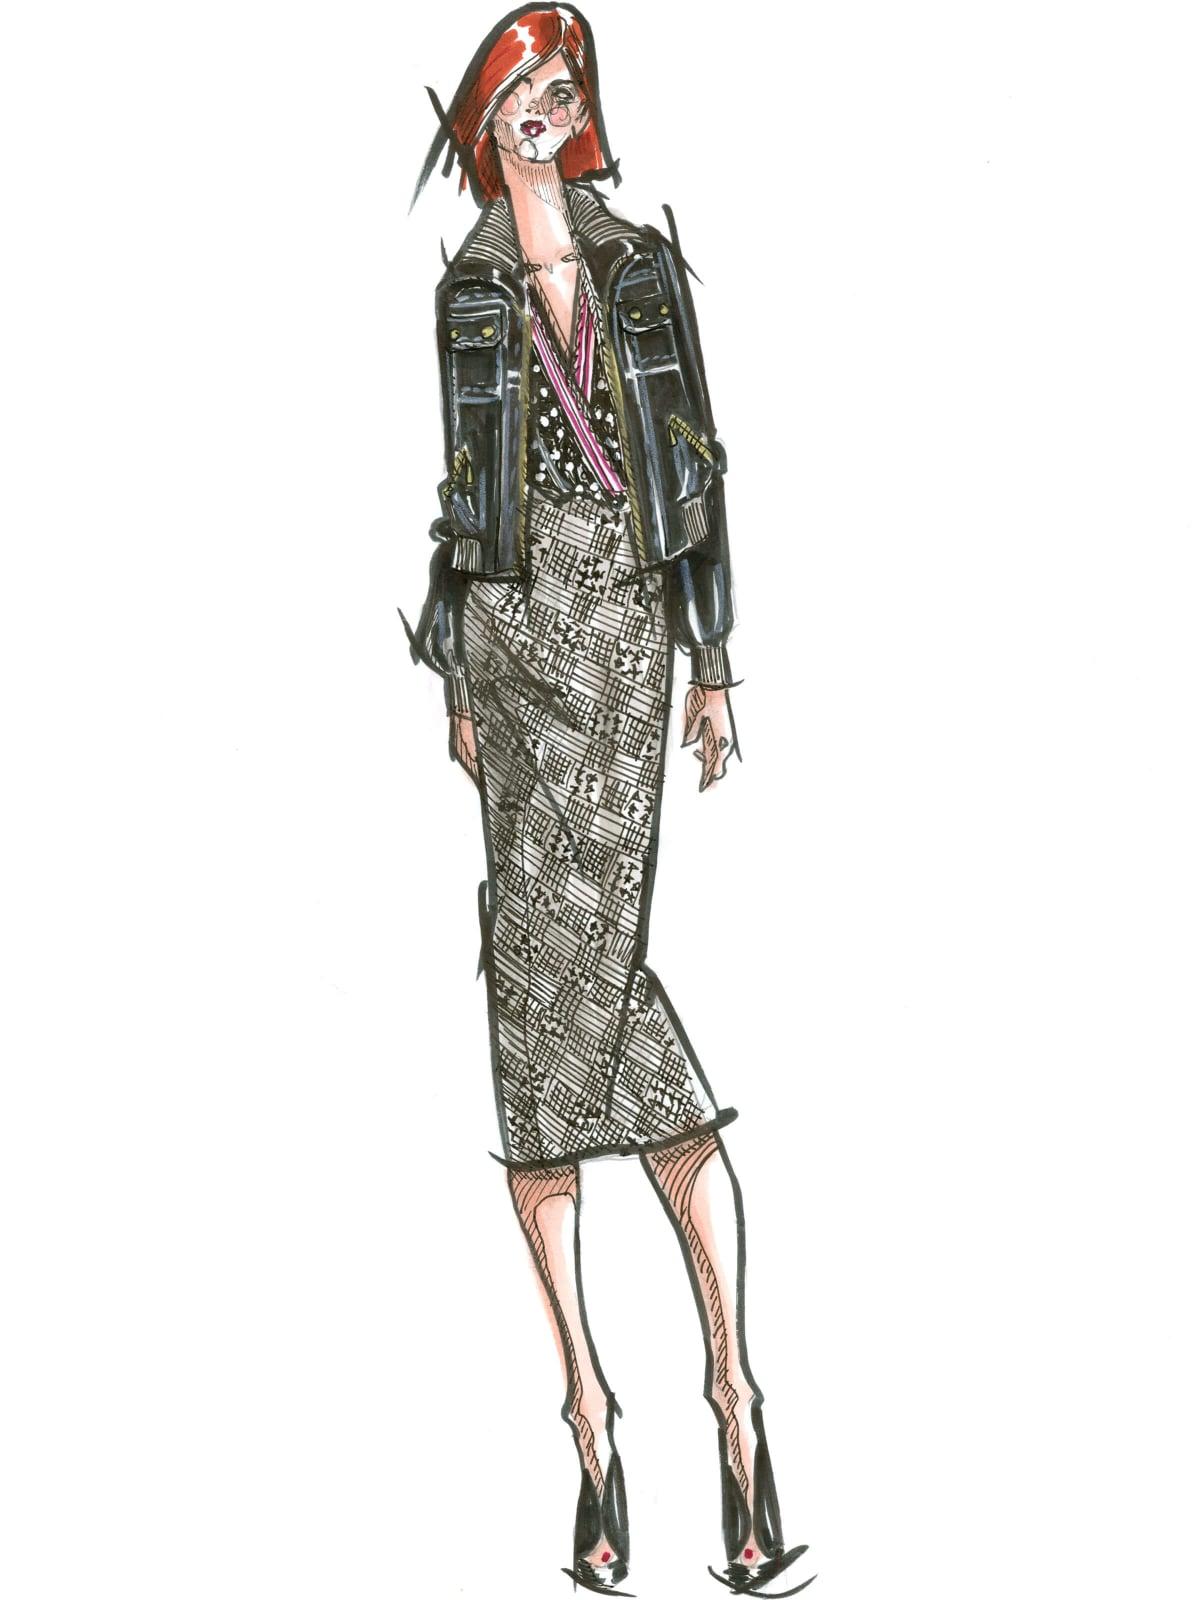 Trina Turk inspiration New York Fashion Week fall 2017